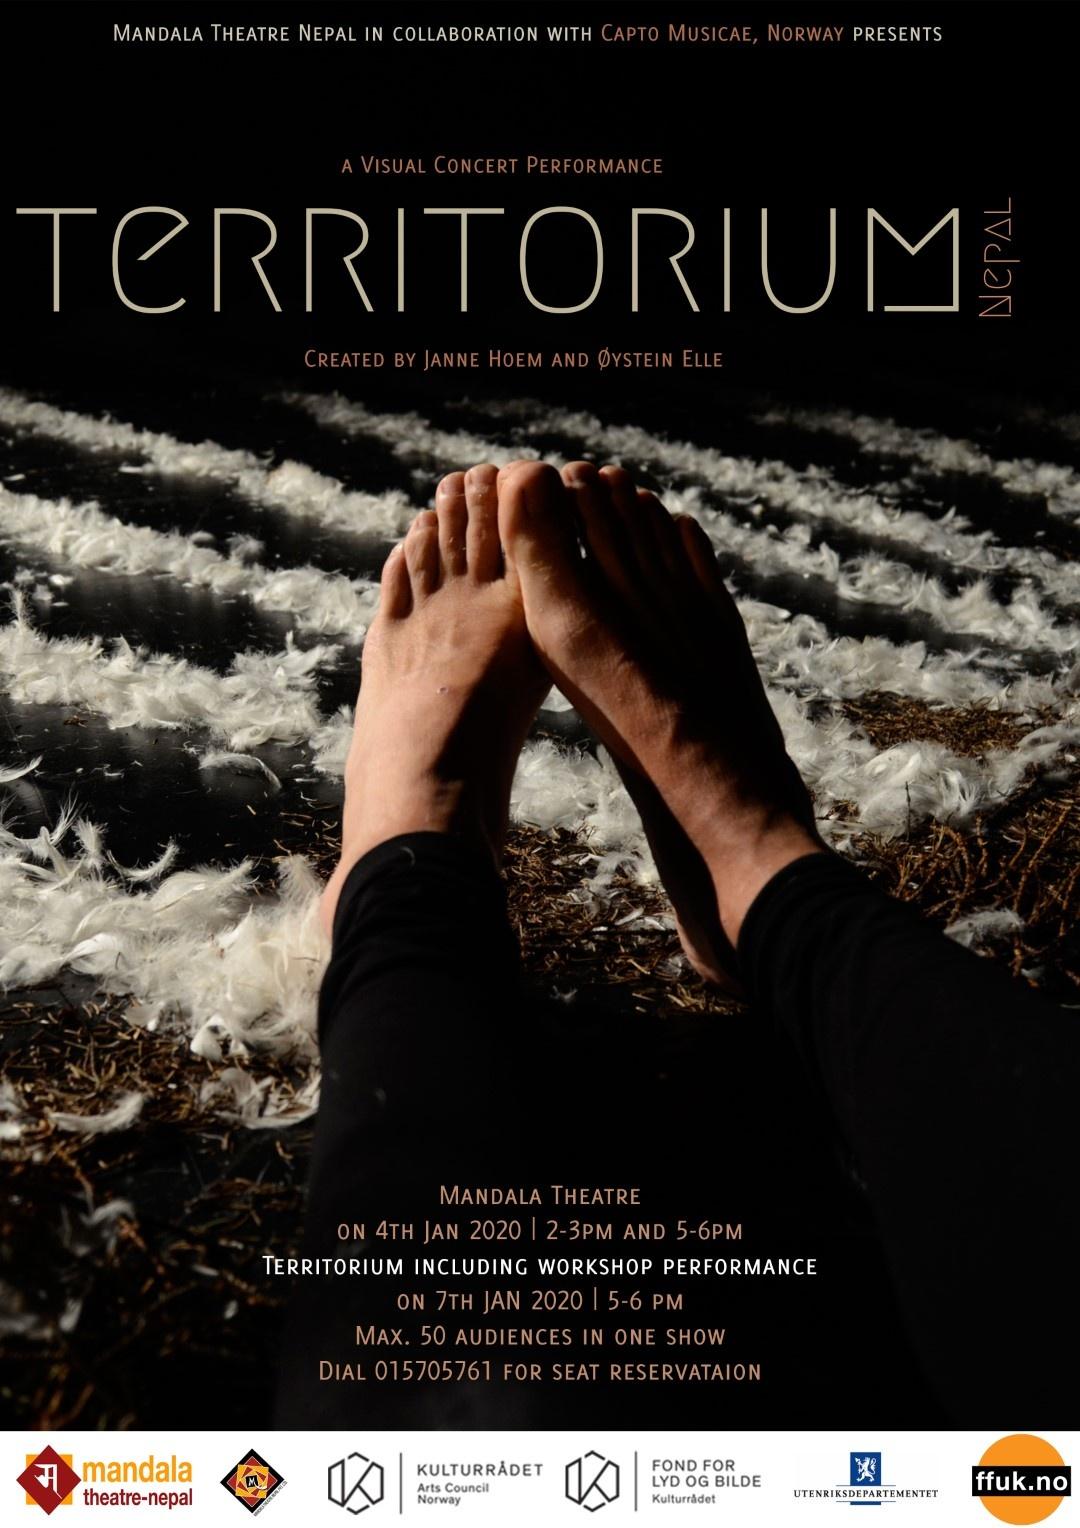 Territorium Nepal – a Visual Concert Performance